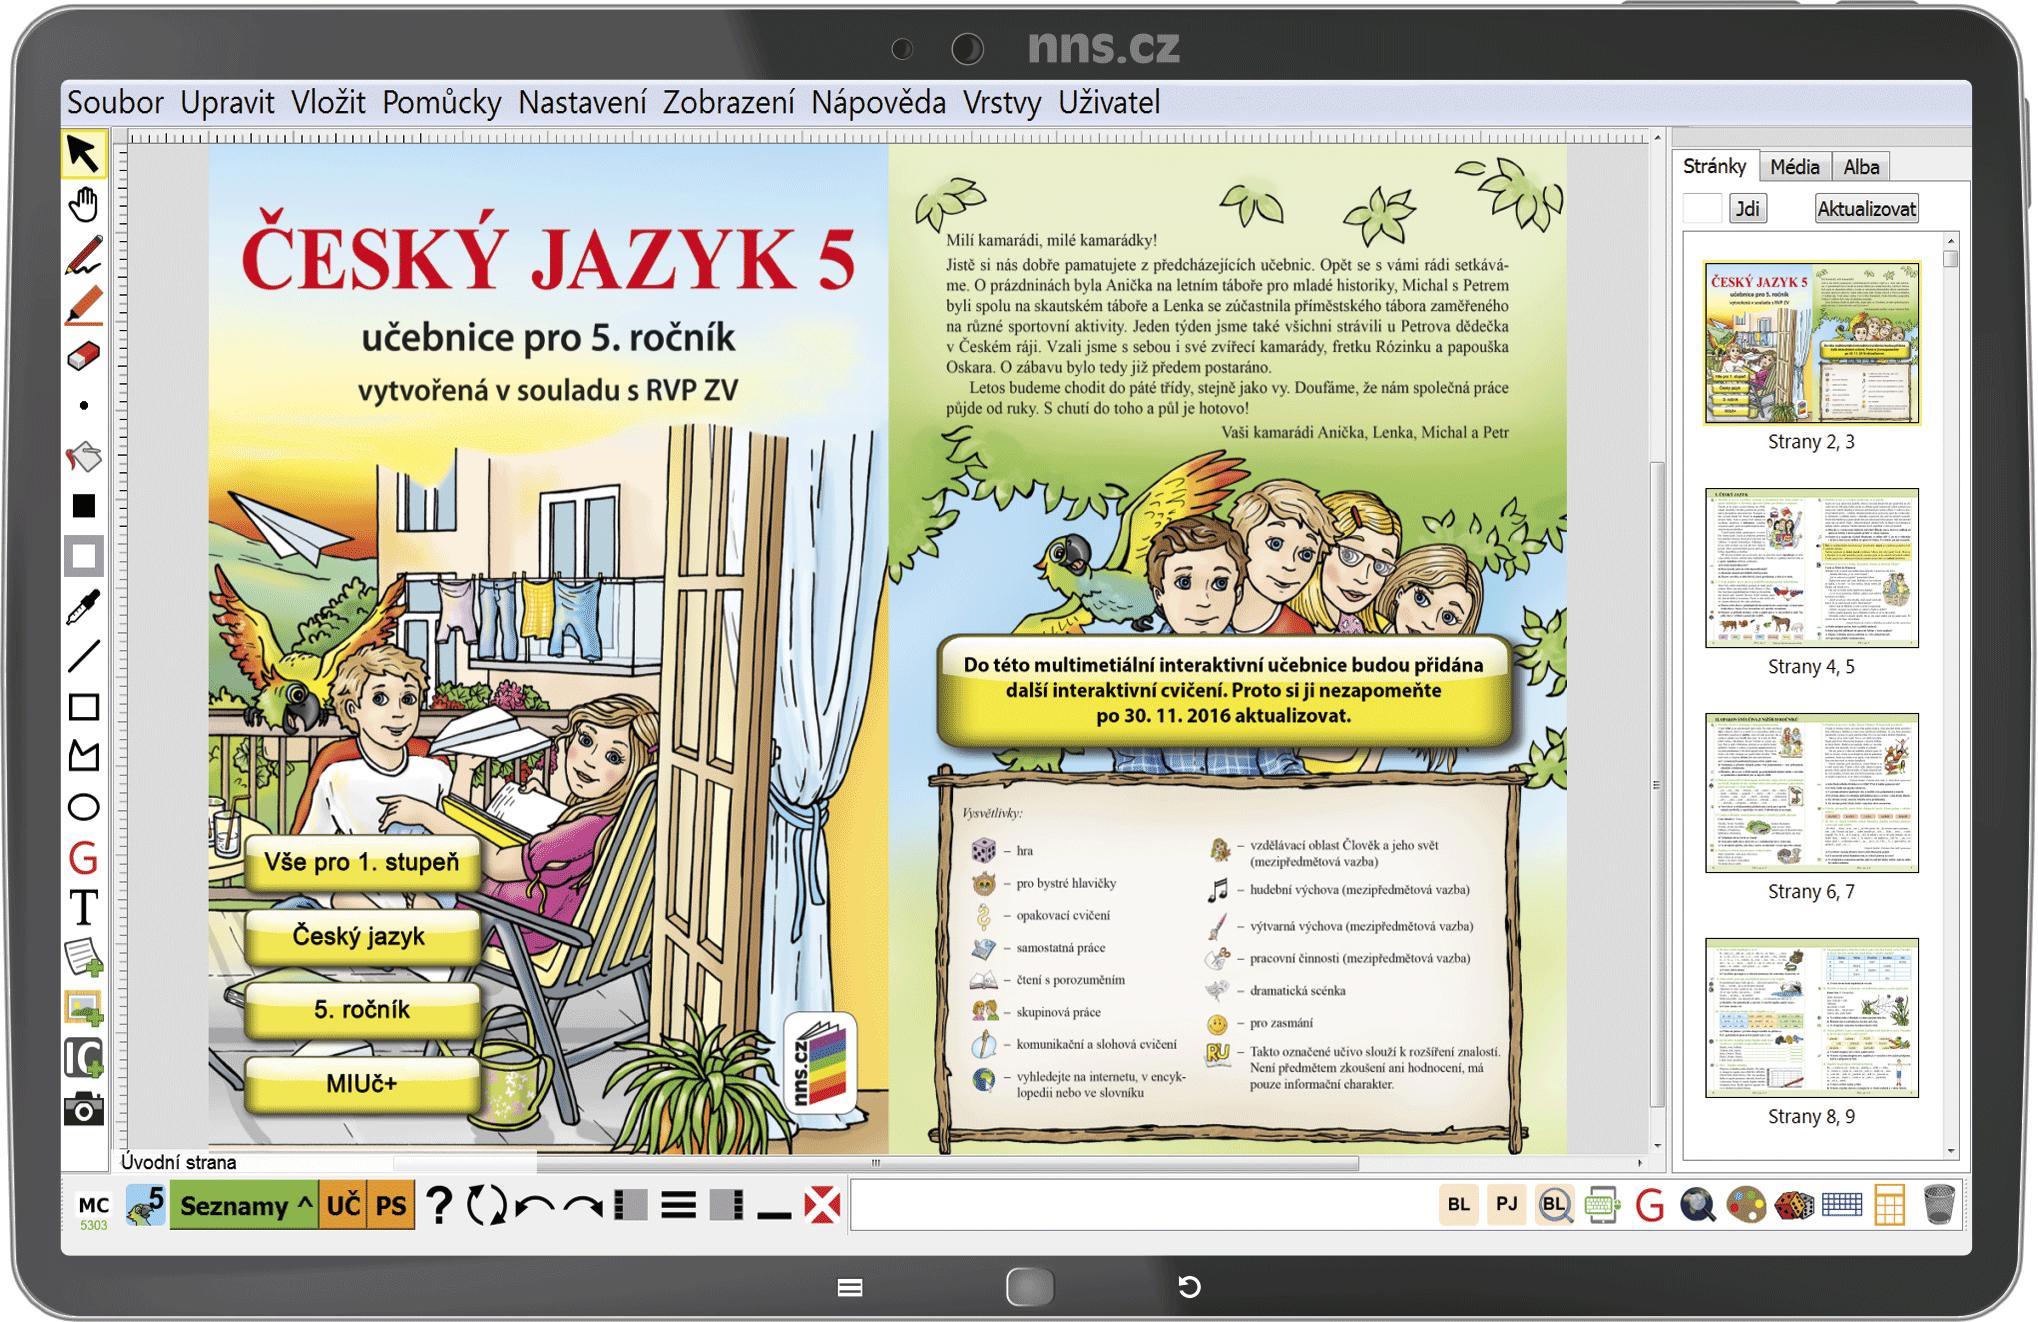 MIUč+ Český jazyk 5 - žák. licence na 1 šk. rok NOVINKA